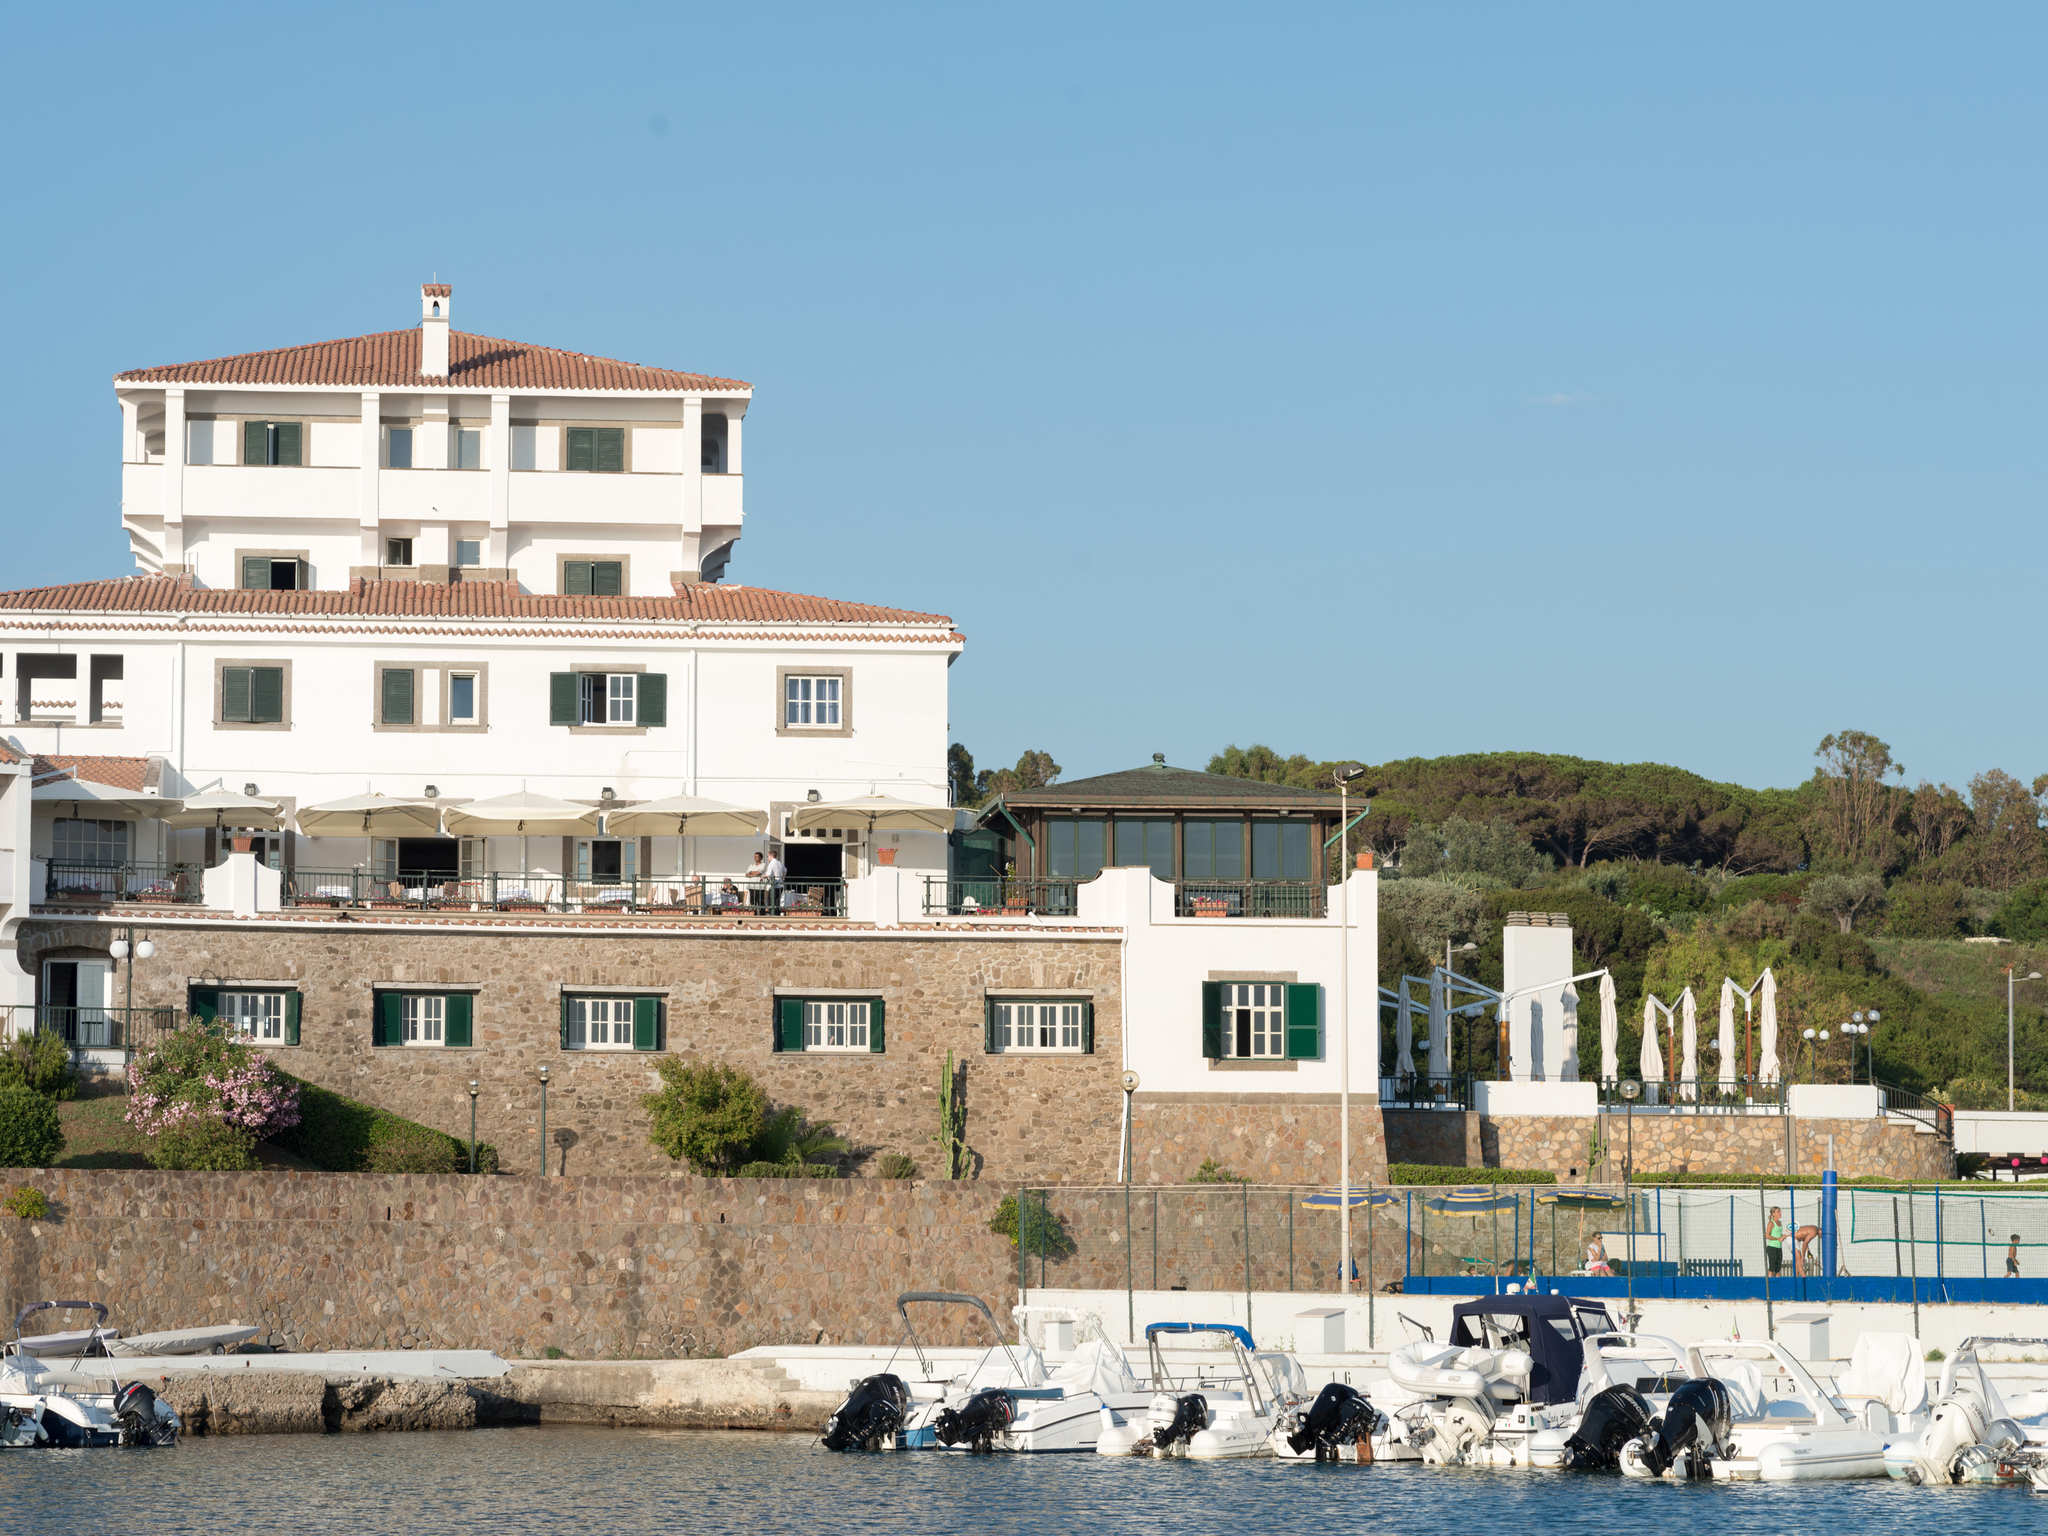 Hotel - Mercure Civitavecchia Sunbay Park Hotel - New Opening